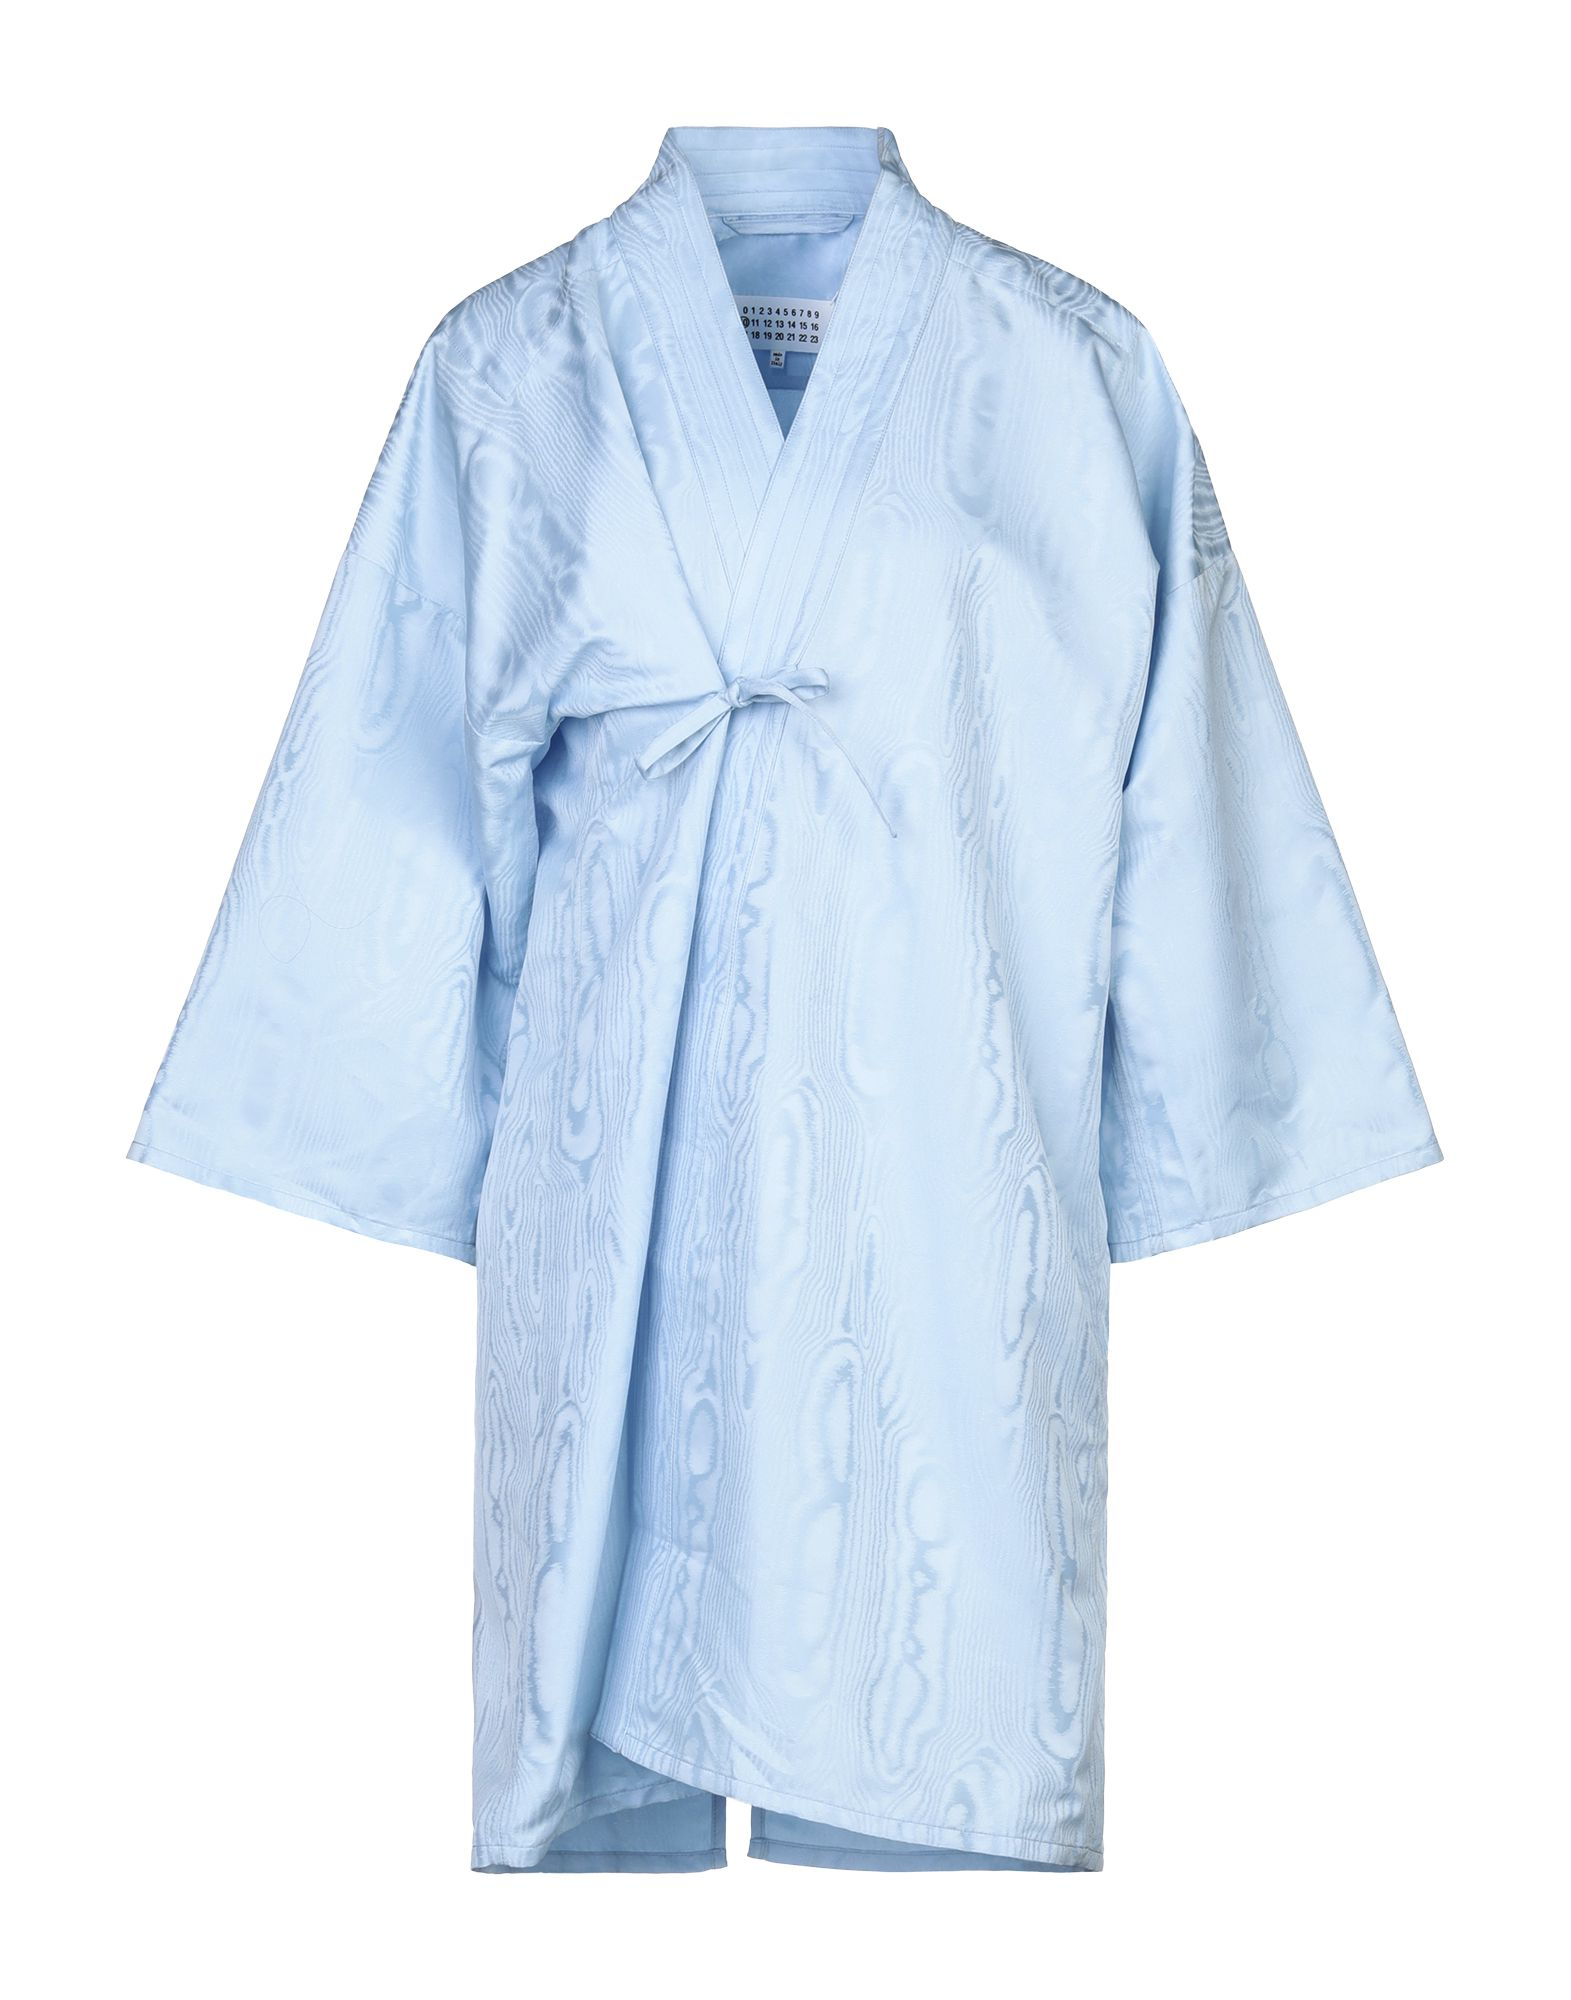 MAISON MARGIELA Легкое пальто maison margiela 1 легкое пальто